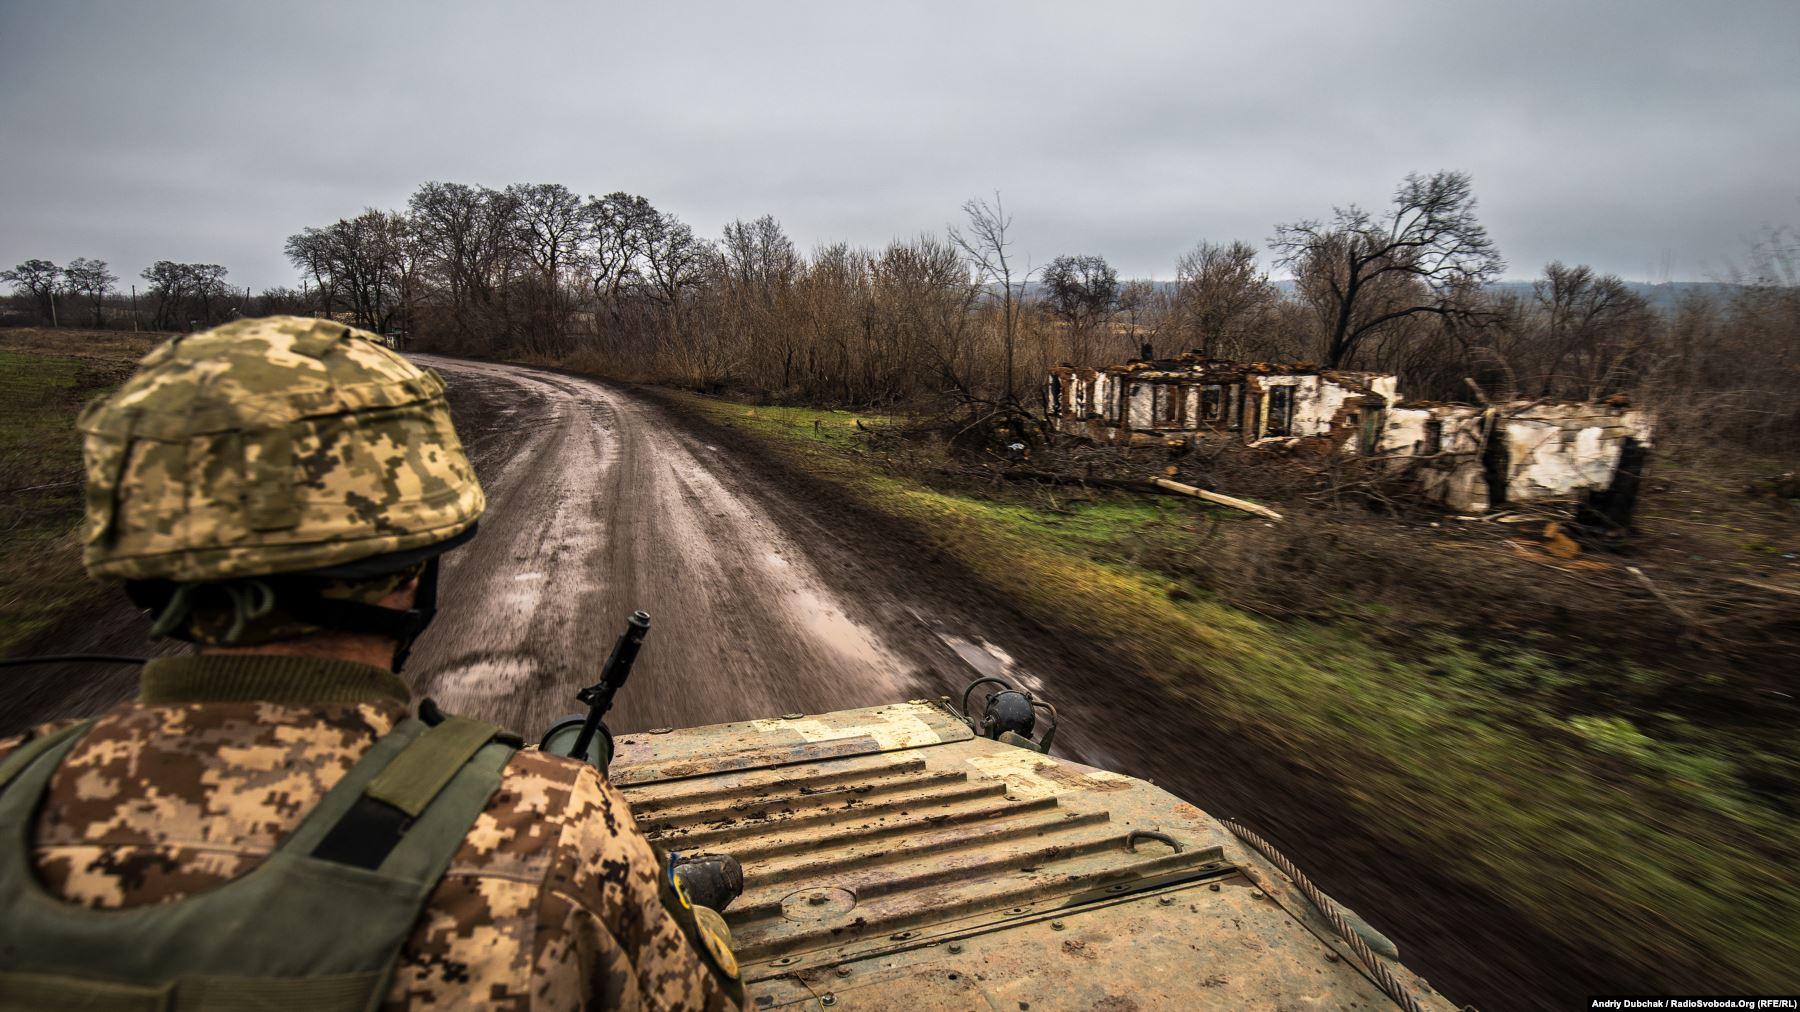 Andriy Dubchak photo. Ukraine photographer and correspondent.